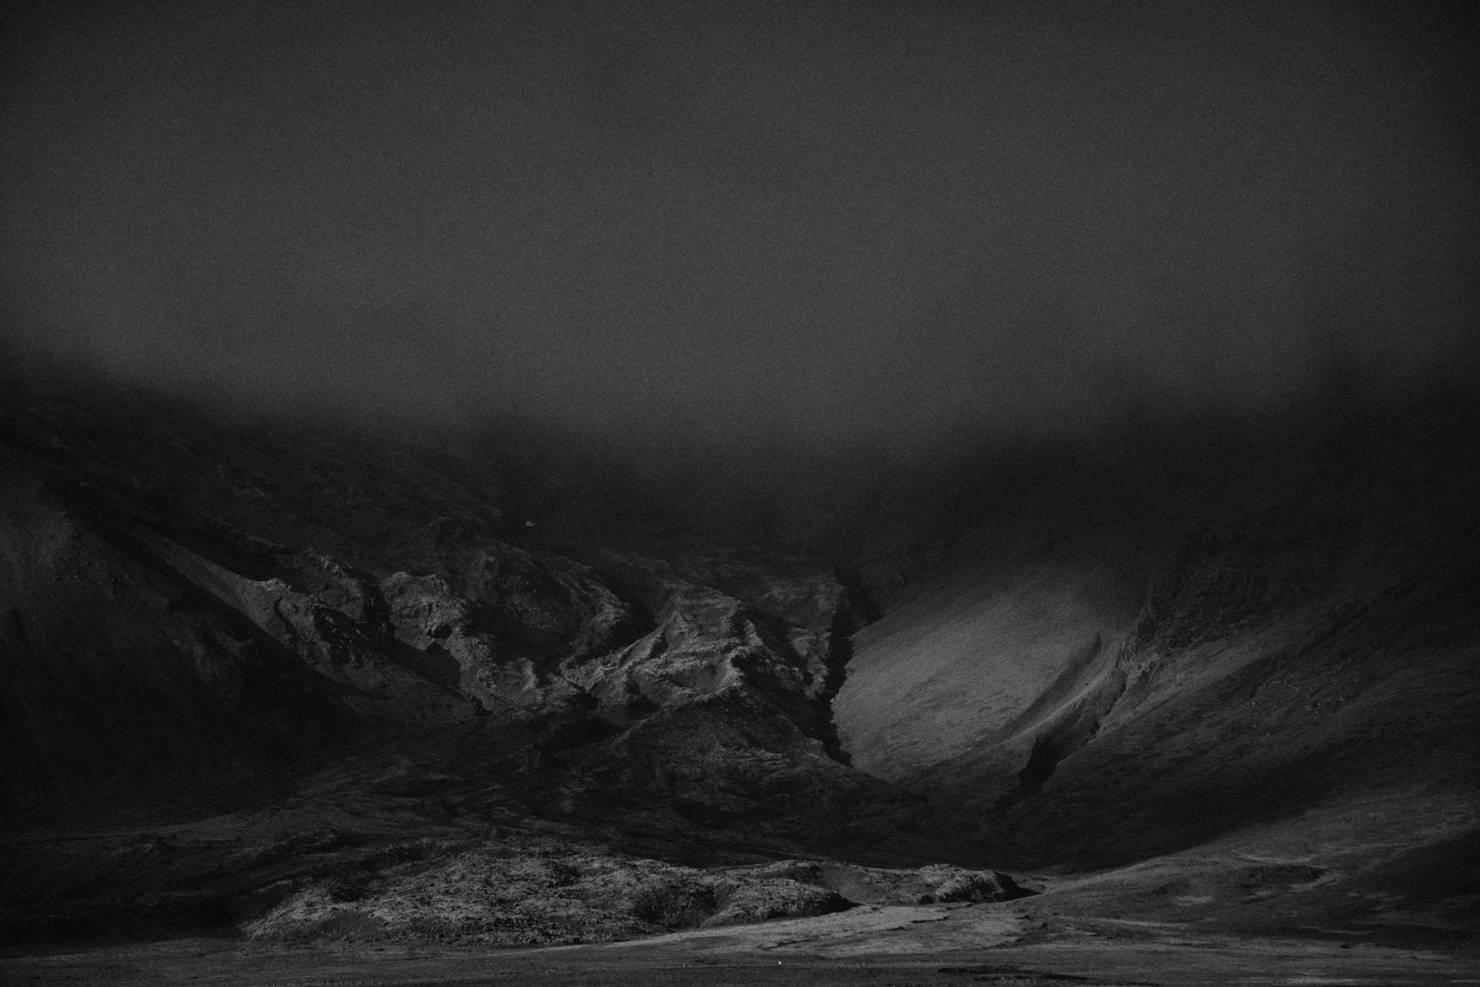 patrick_schuttler_landscape_iceland_006-a3ab6598900d4287892461462123aea9